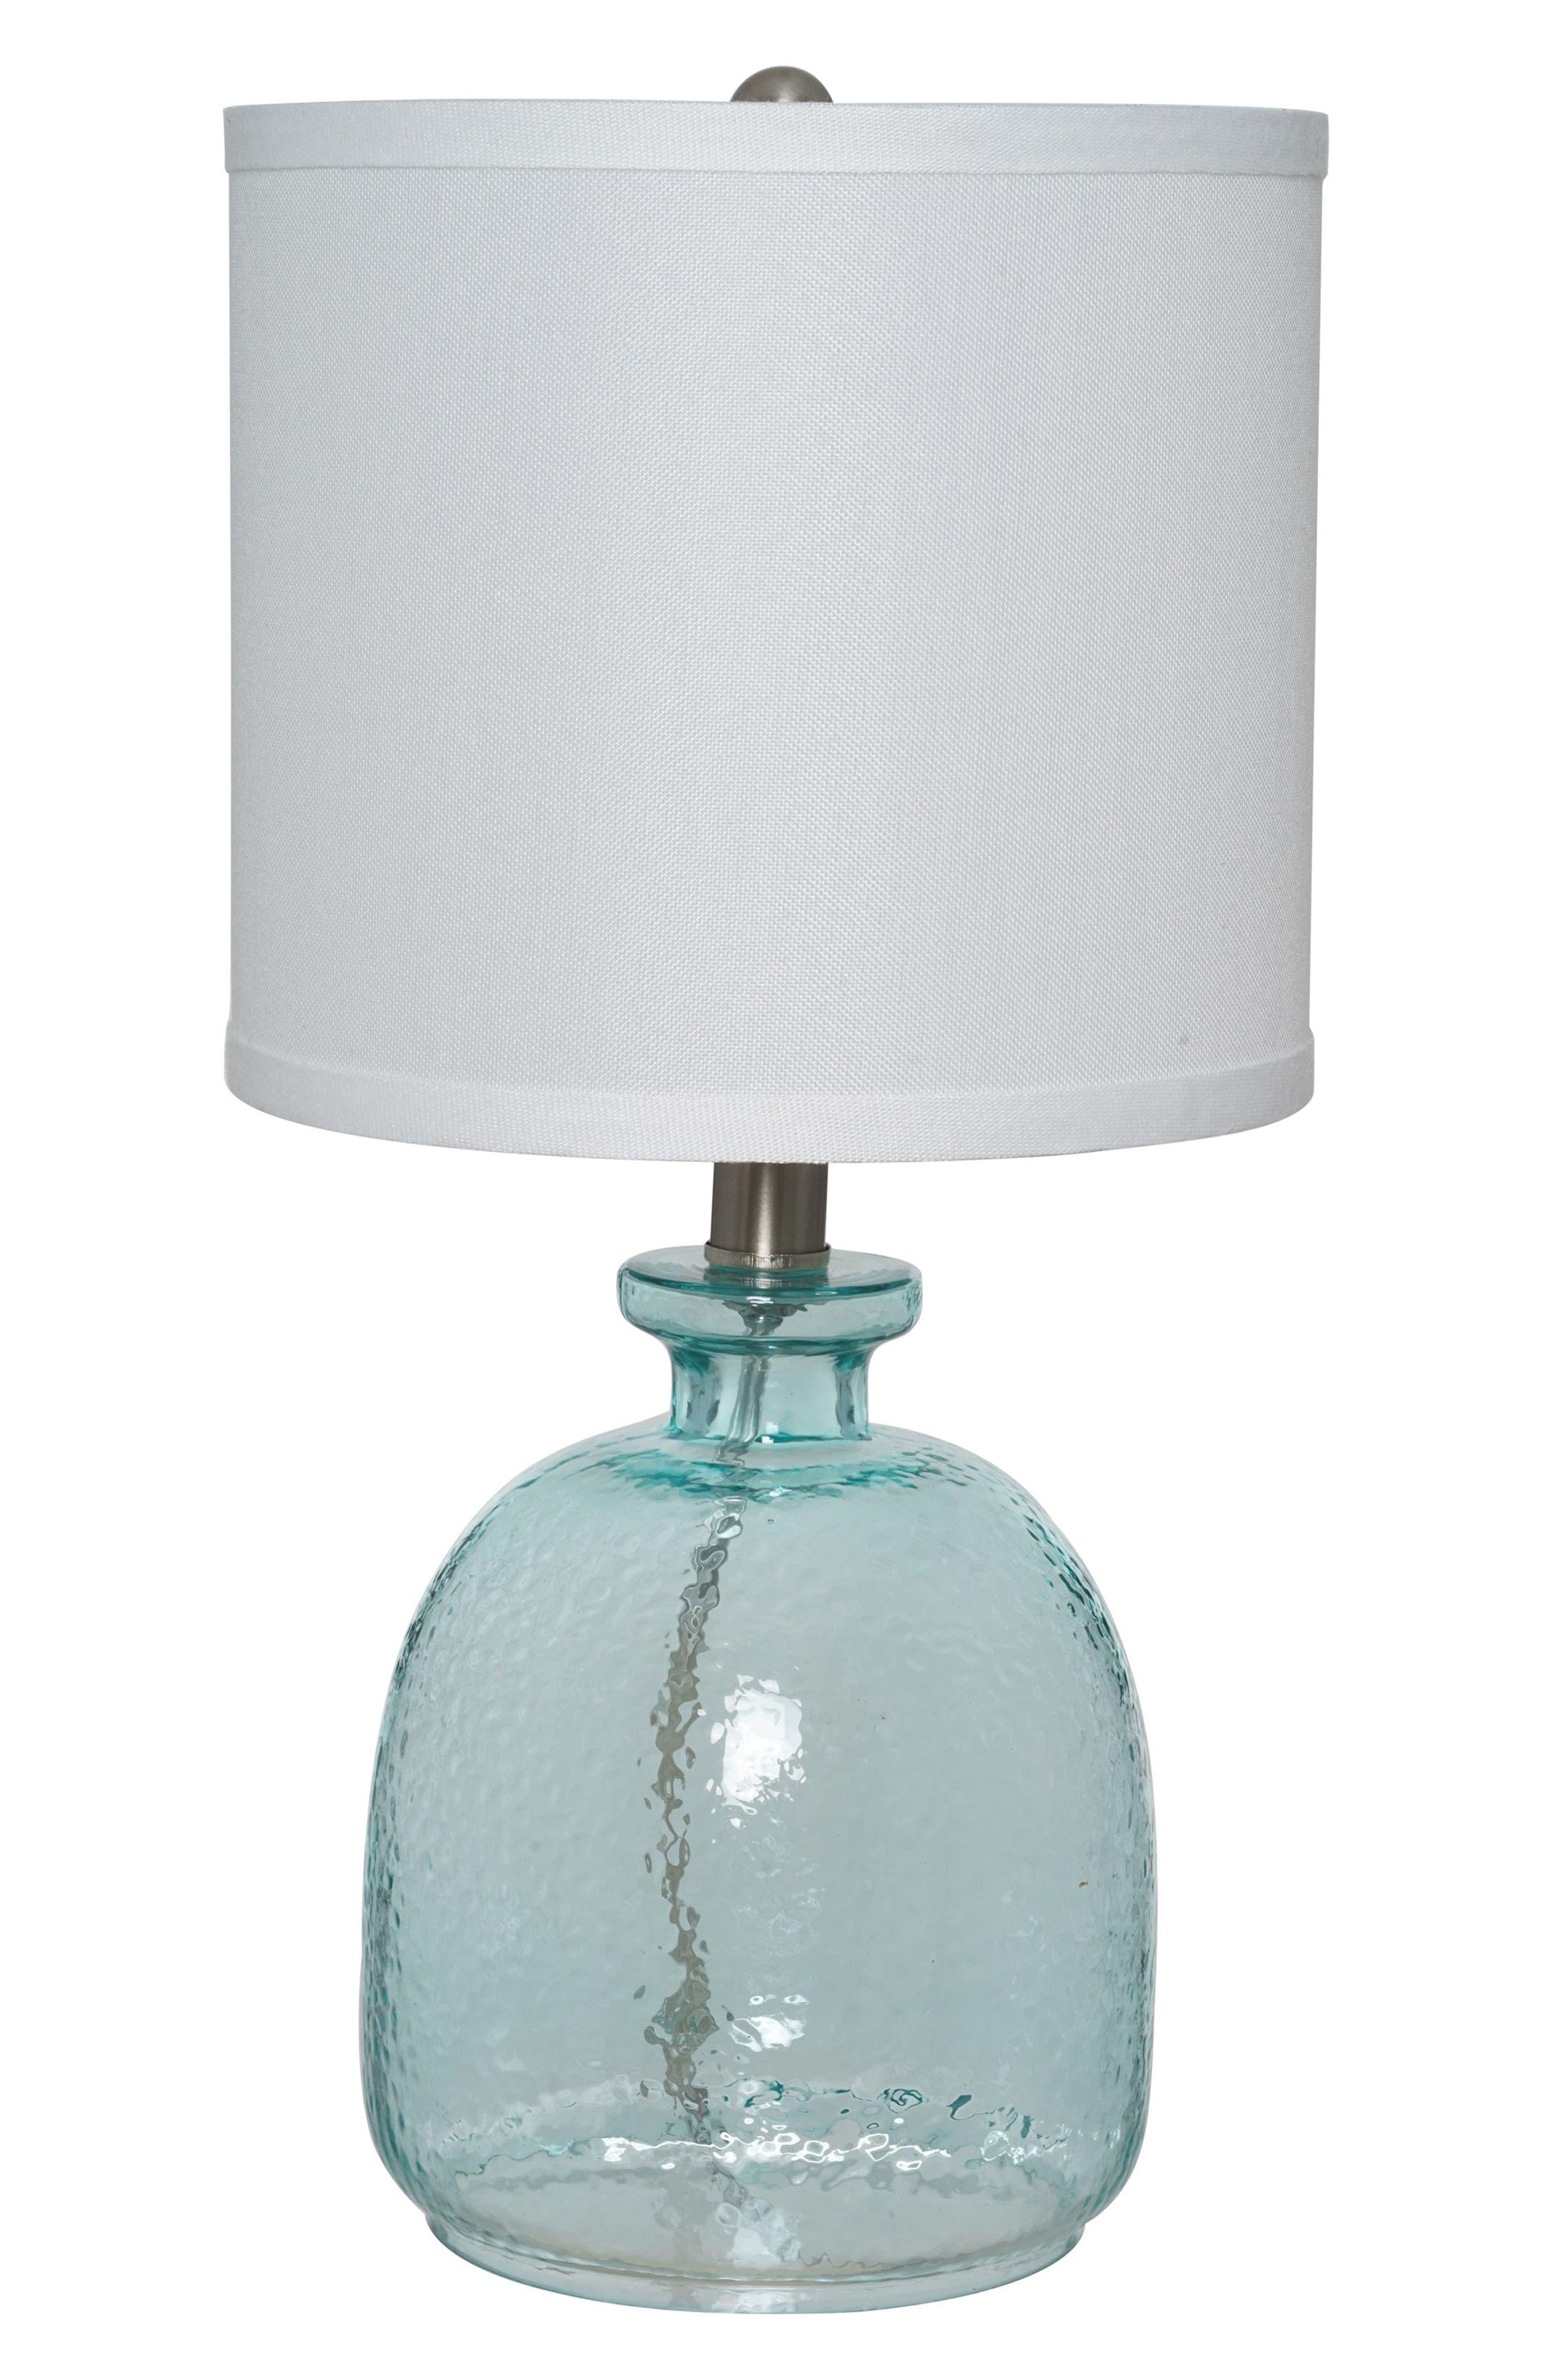 Ocean Glass Accent Lamp,                         Main,                         color, Ocean Blue